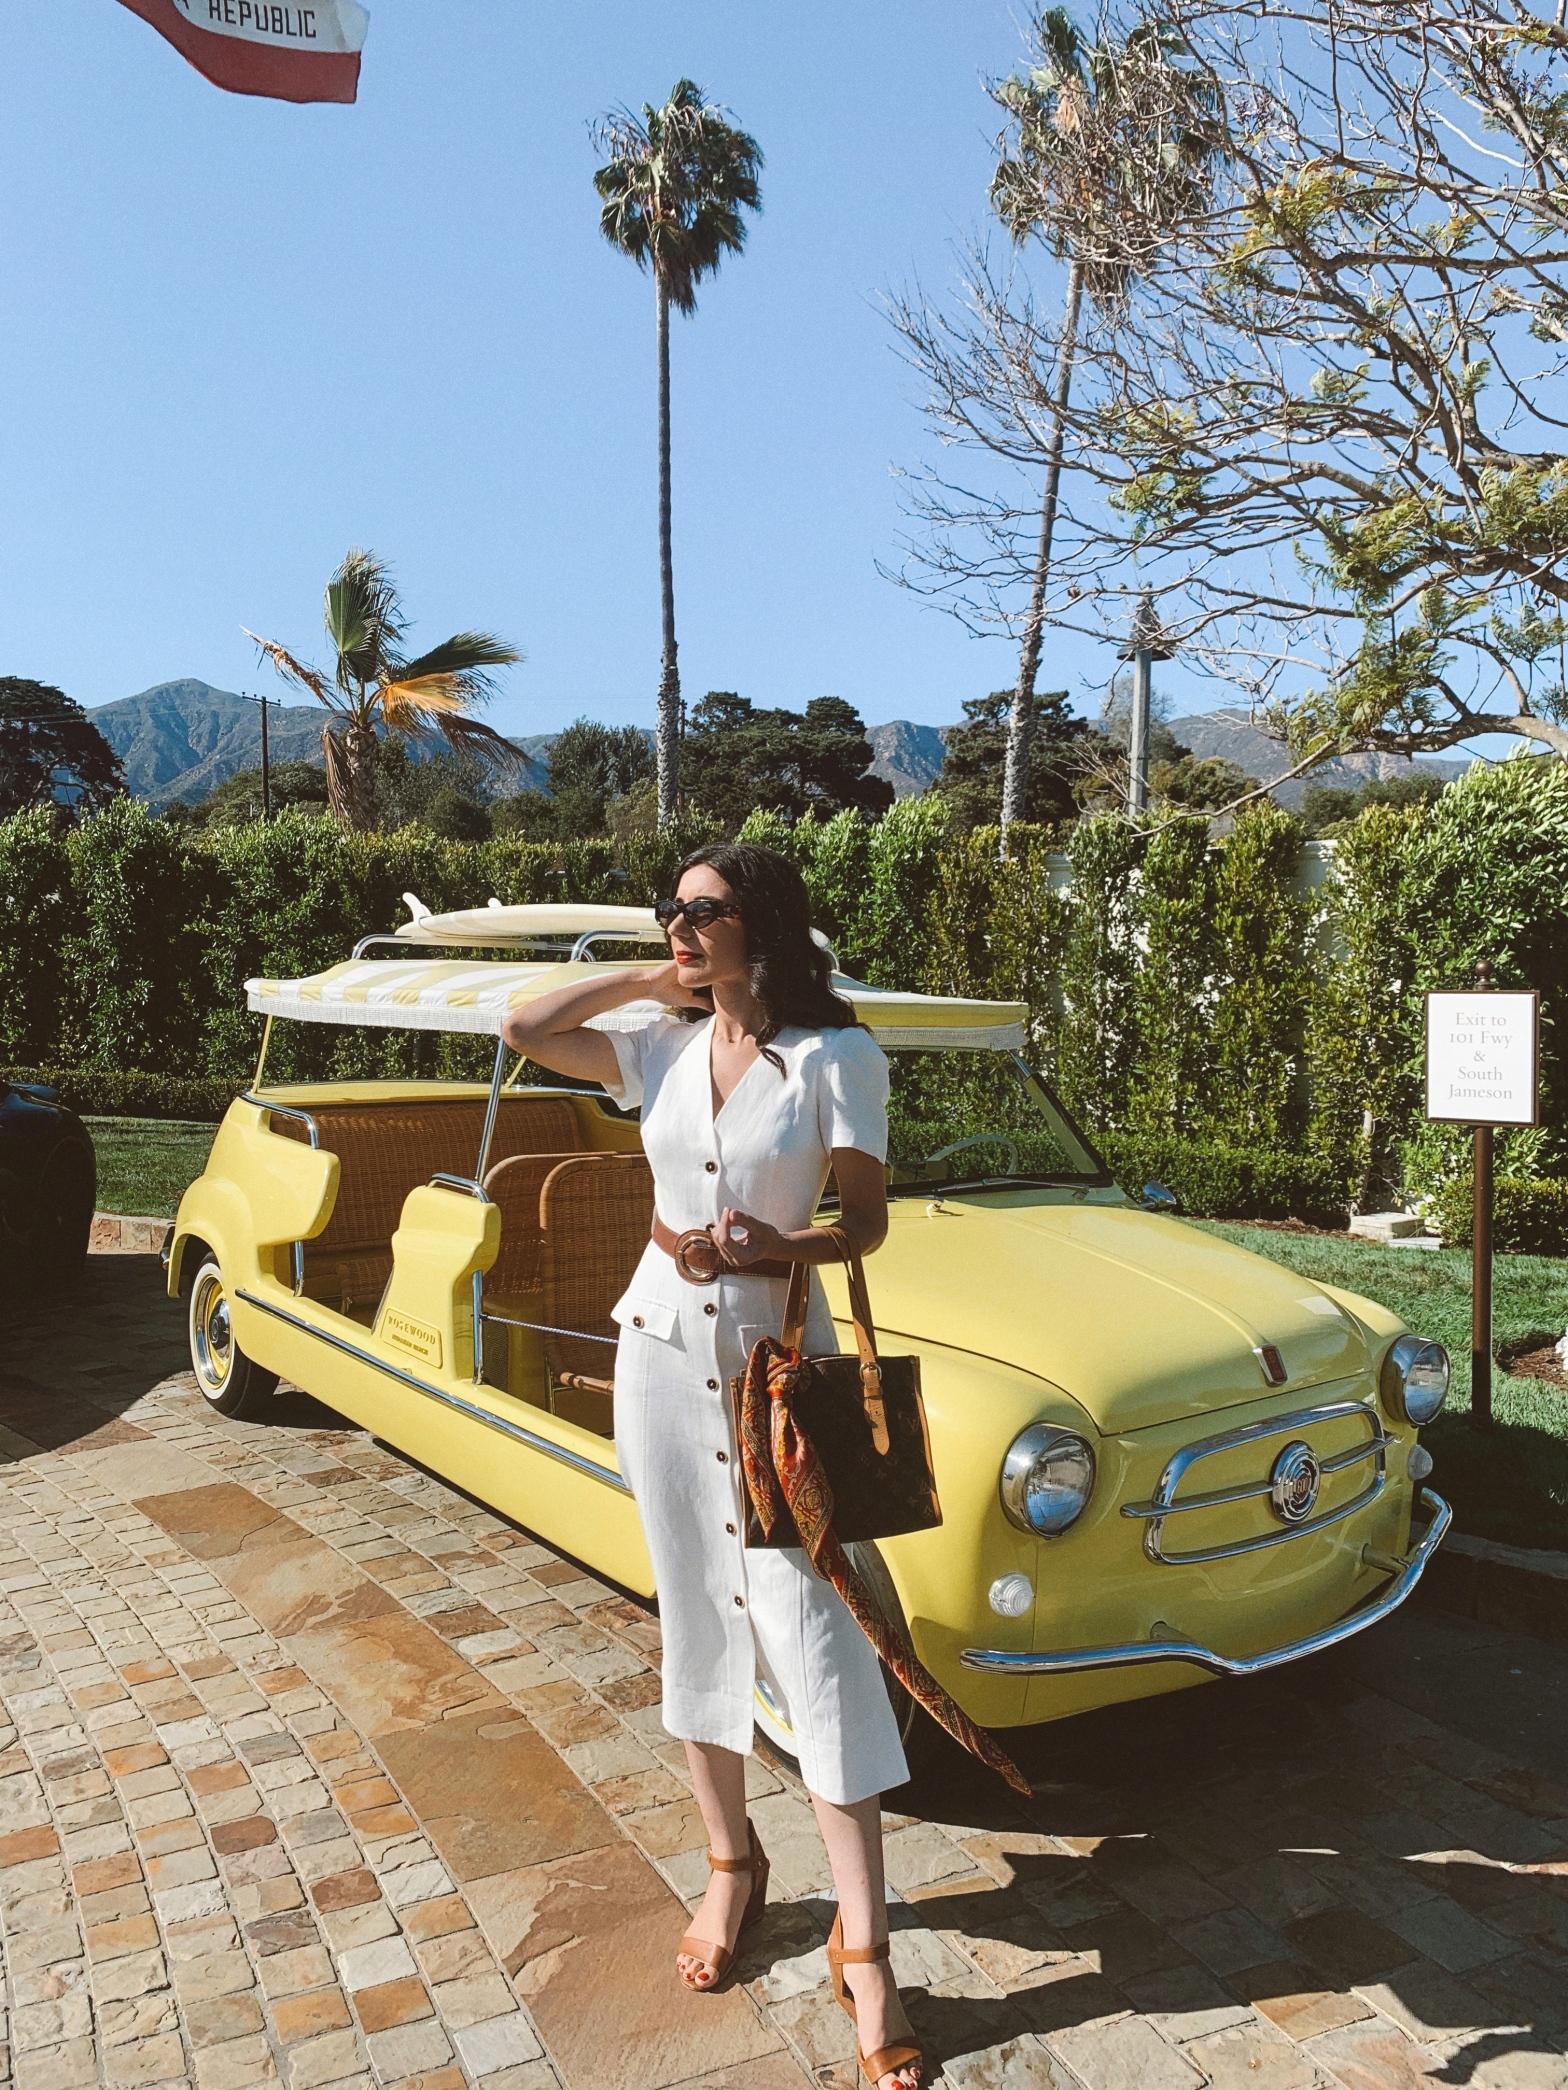 Dior, Dior Pop-up Rosewood Miramar, Rosewood Miramar Beach, Montecito, Santa Barbara, Meghan Markle, Karen Millen, summer fashion, summer 2021, Louis Vuitton, silk scarf, beach fashion, Grace Kelly, Grace Kelly style, American Riviera